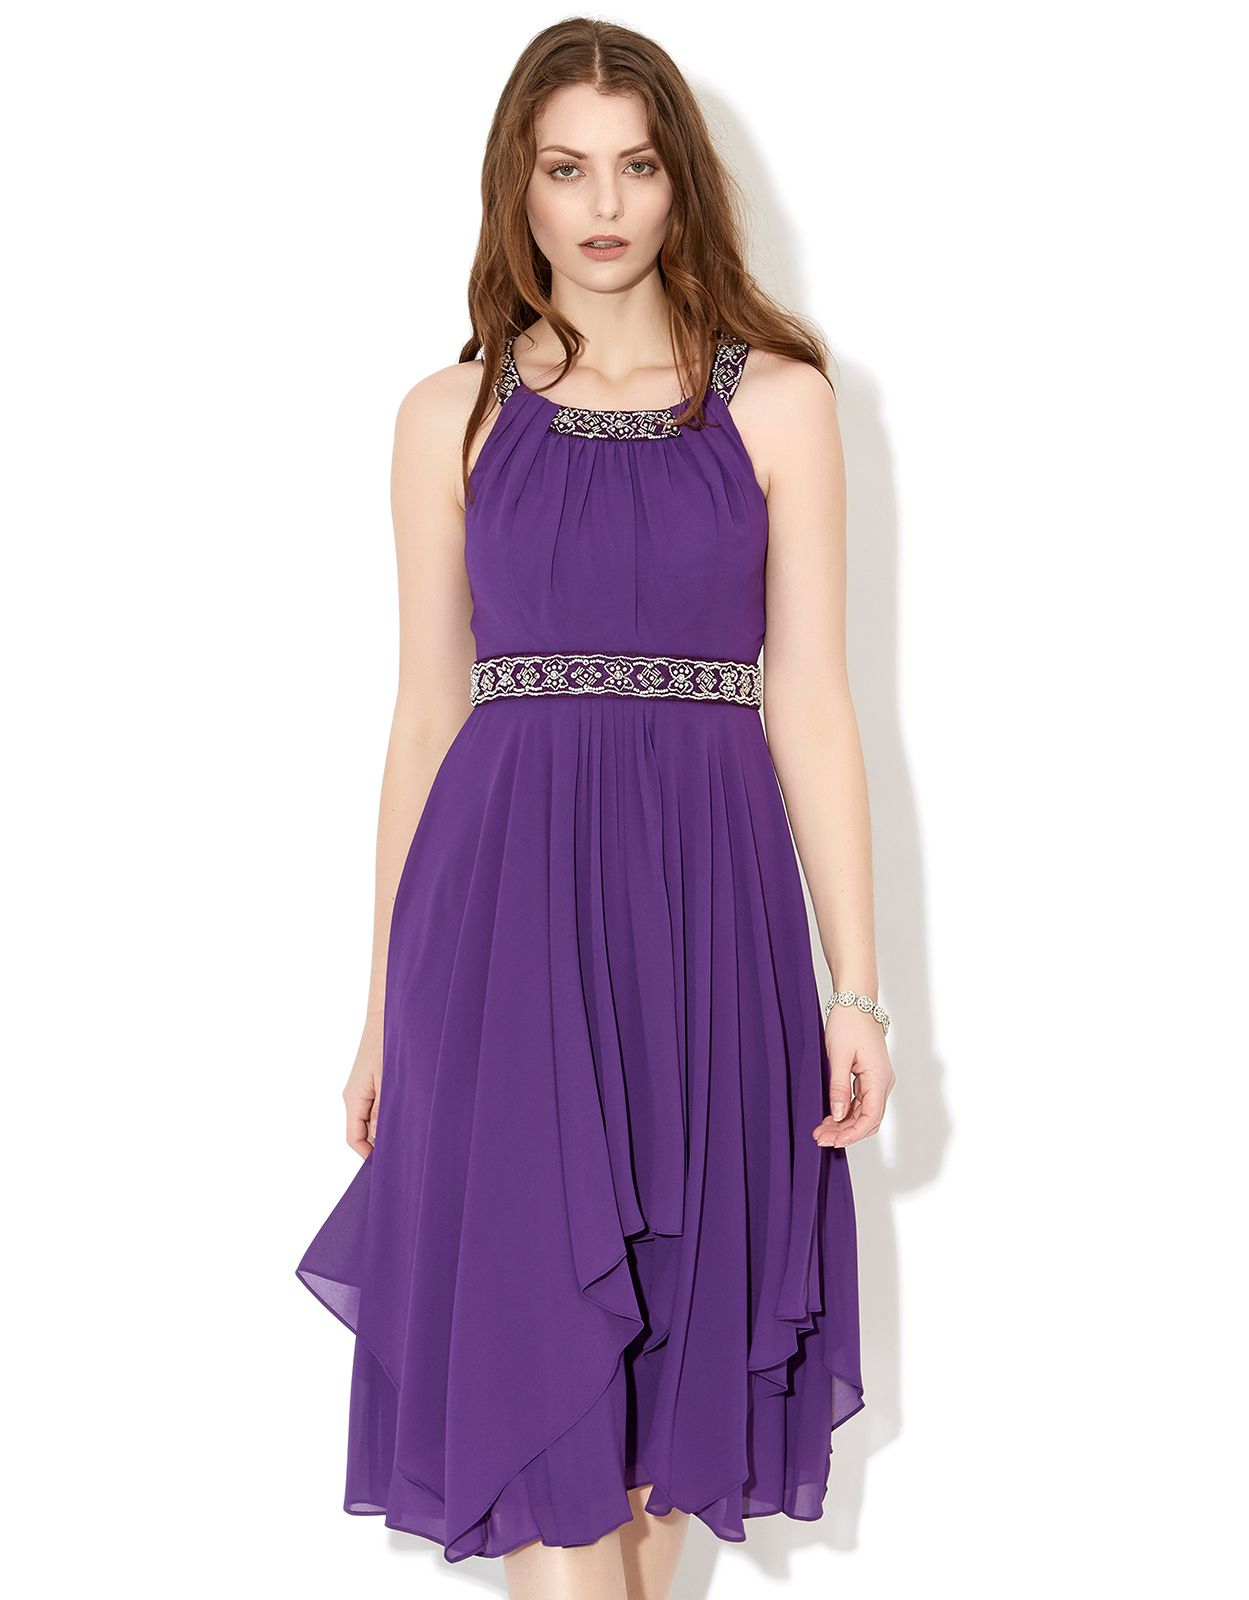 Annalise Dress | Purple | Monsoon | Dresses & Skirts | Pinterest ...